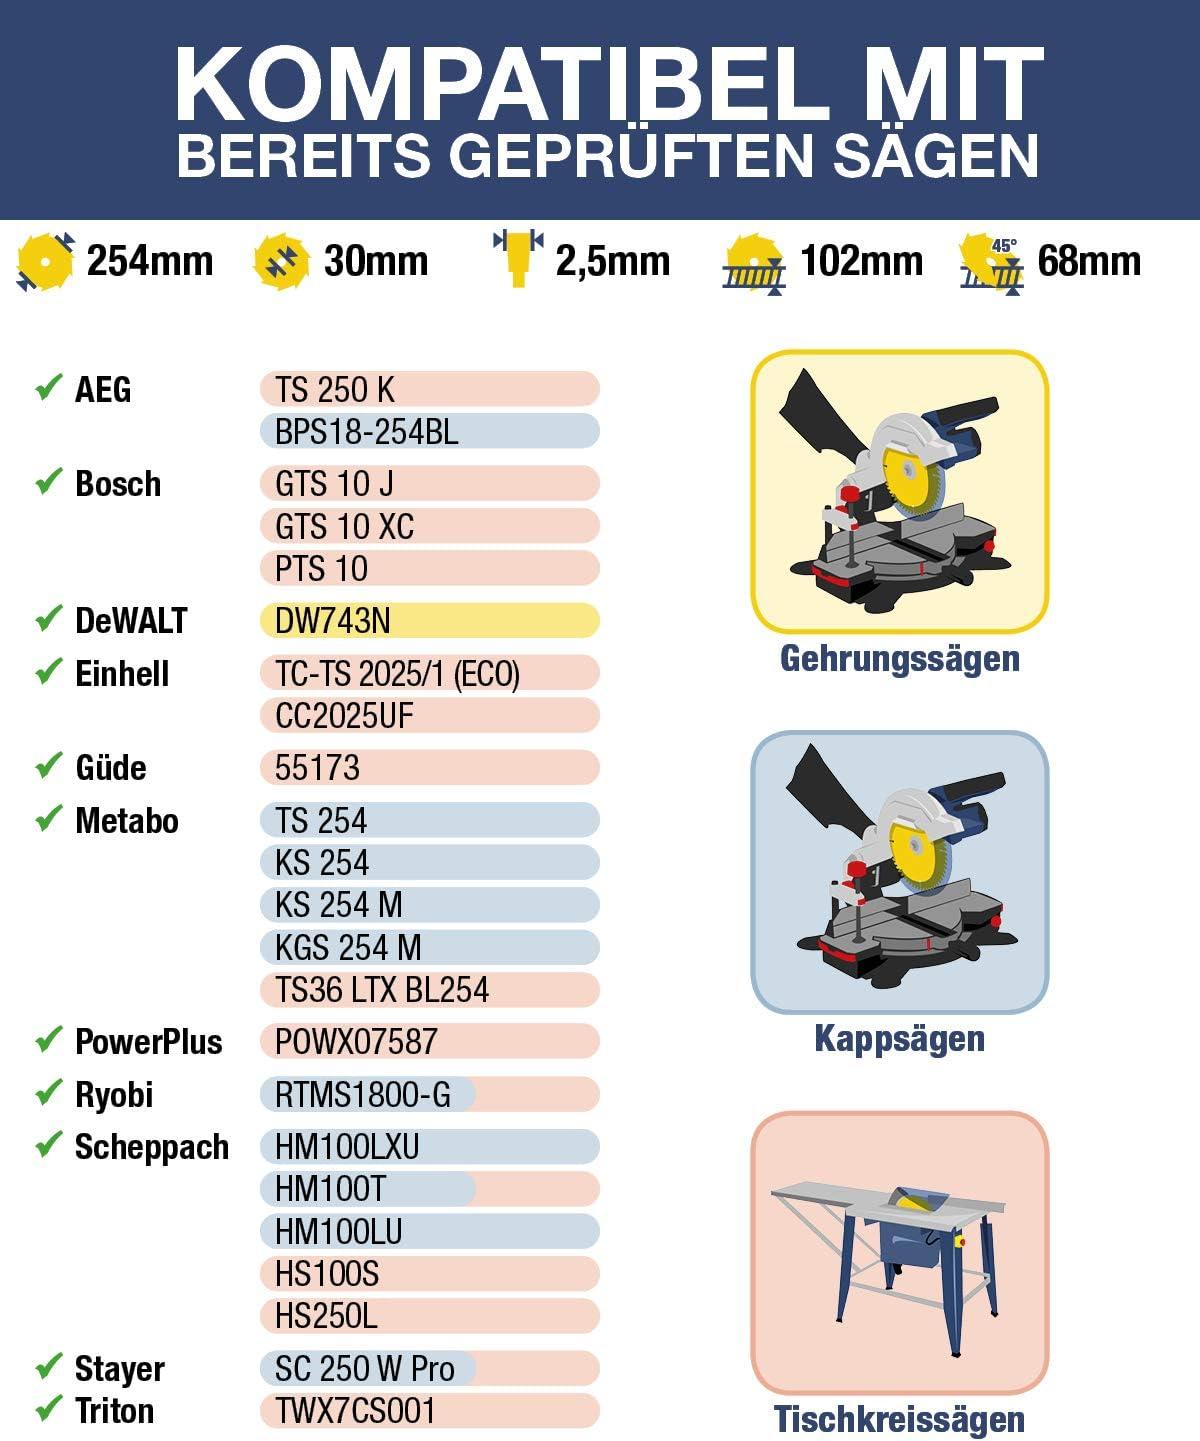 PTS 10 Tischkreiss/äge /& Metabo Kapps/äge KGS 254 M - Kompatibel mit Bosch GTS 10 XC Feiner Schnitt durch 80 HM Z/ähne Falkenwald /® S/ägeblatt 254x30 f/ür Holz DIN EN 847-1 Kreiss/ägeblatt 254 x 30